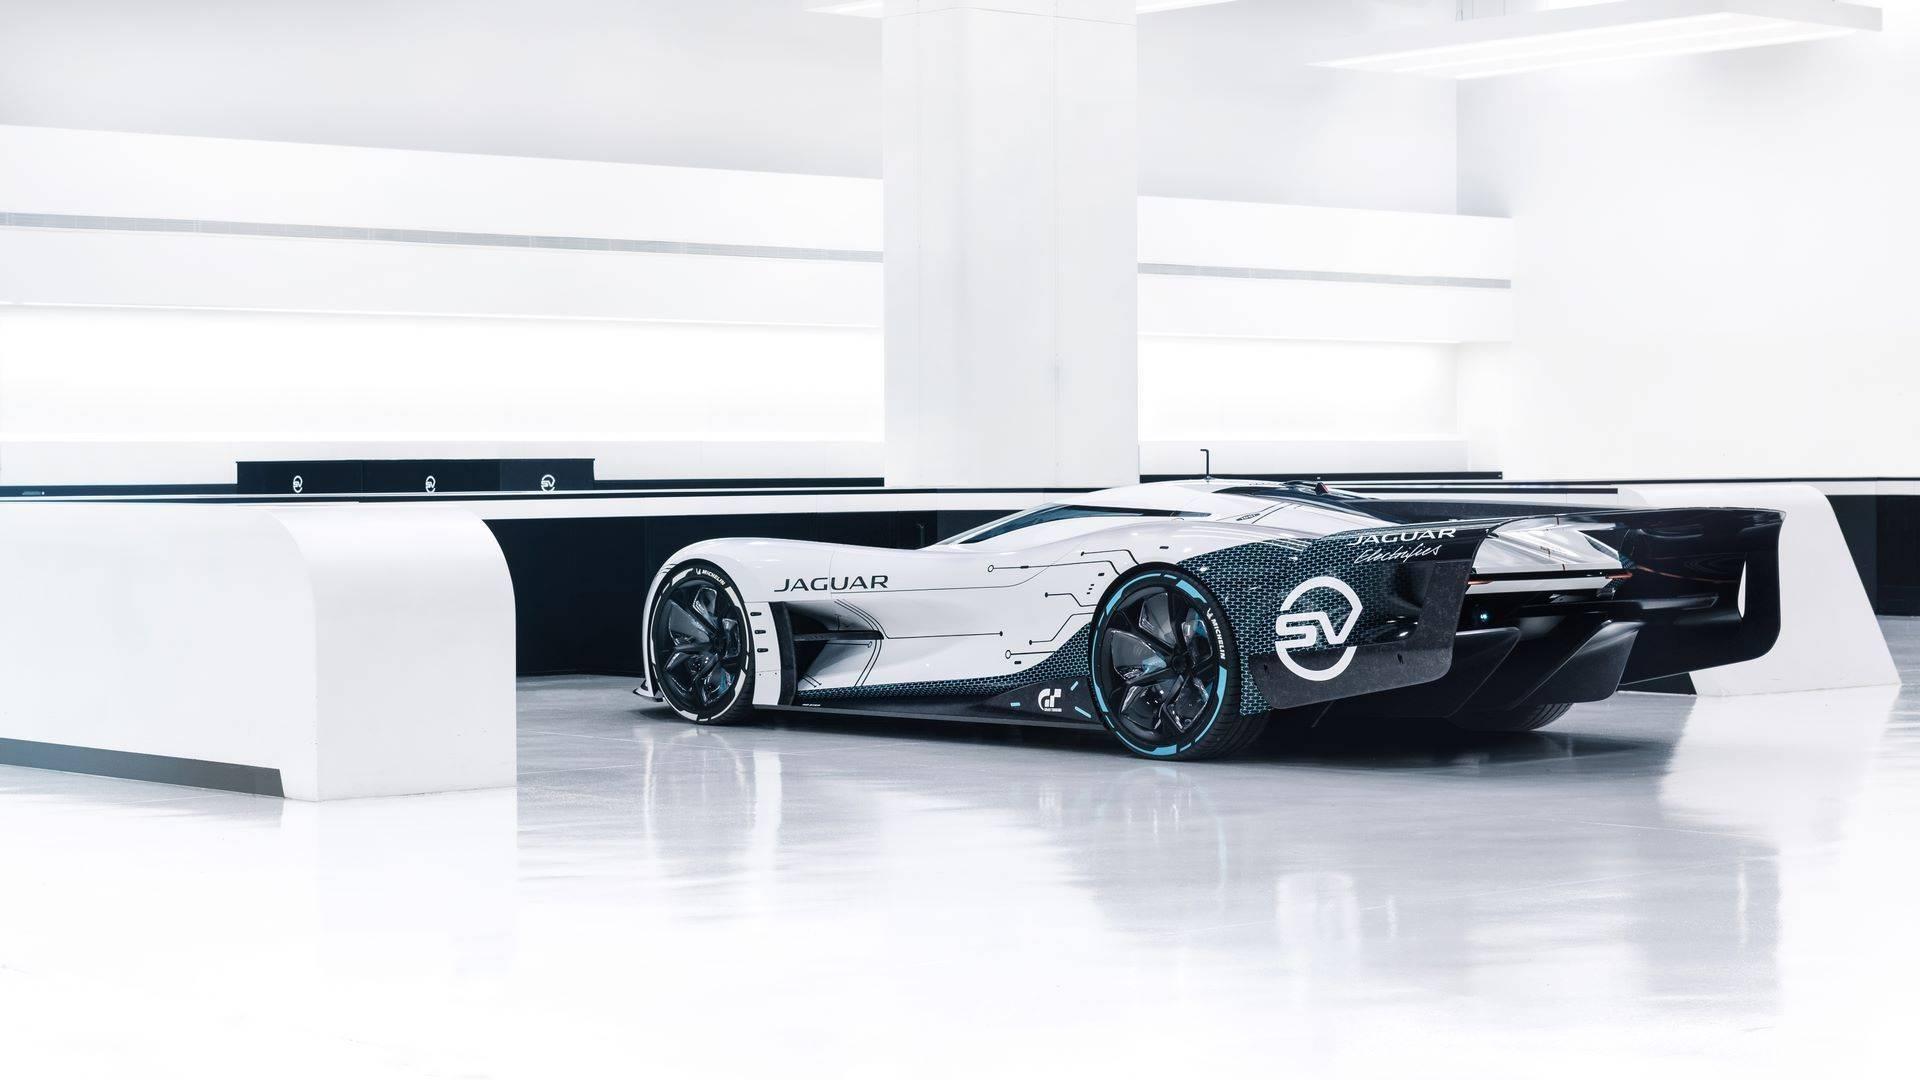 Jaguar-Vision-Gran-Turismo-SV-22